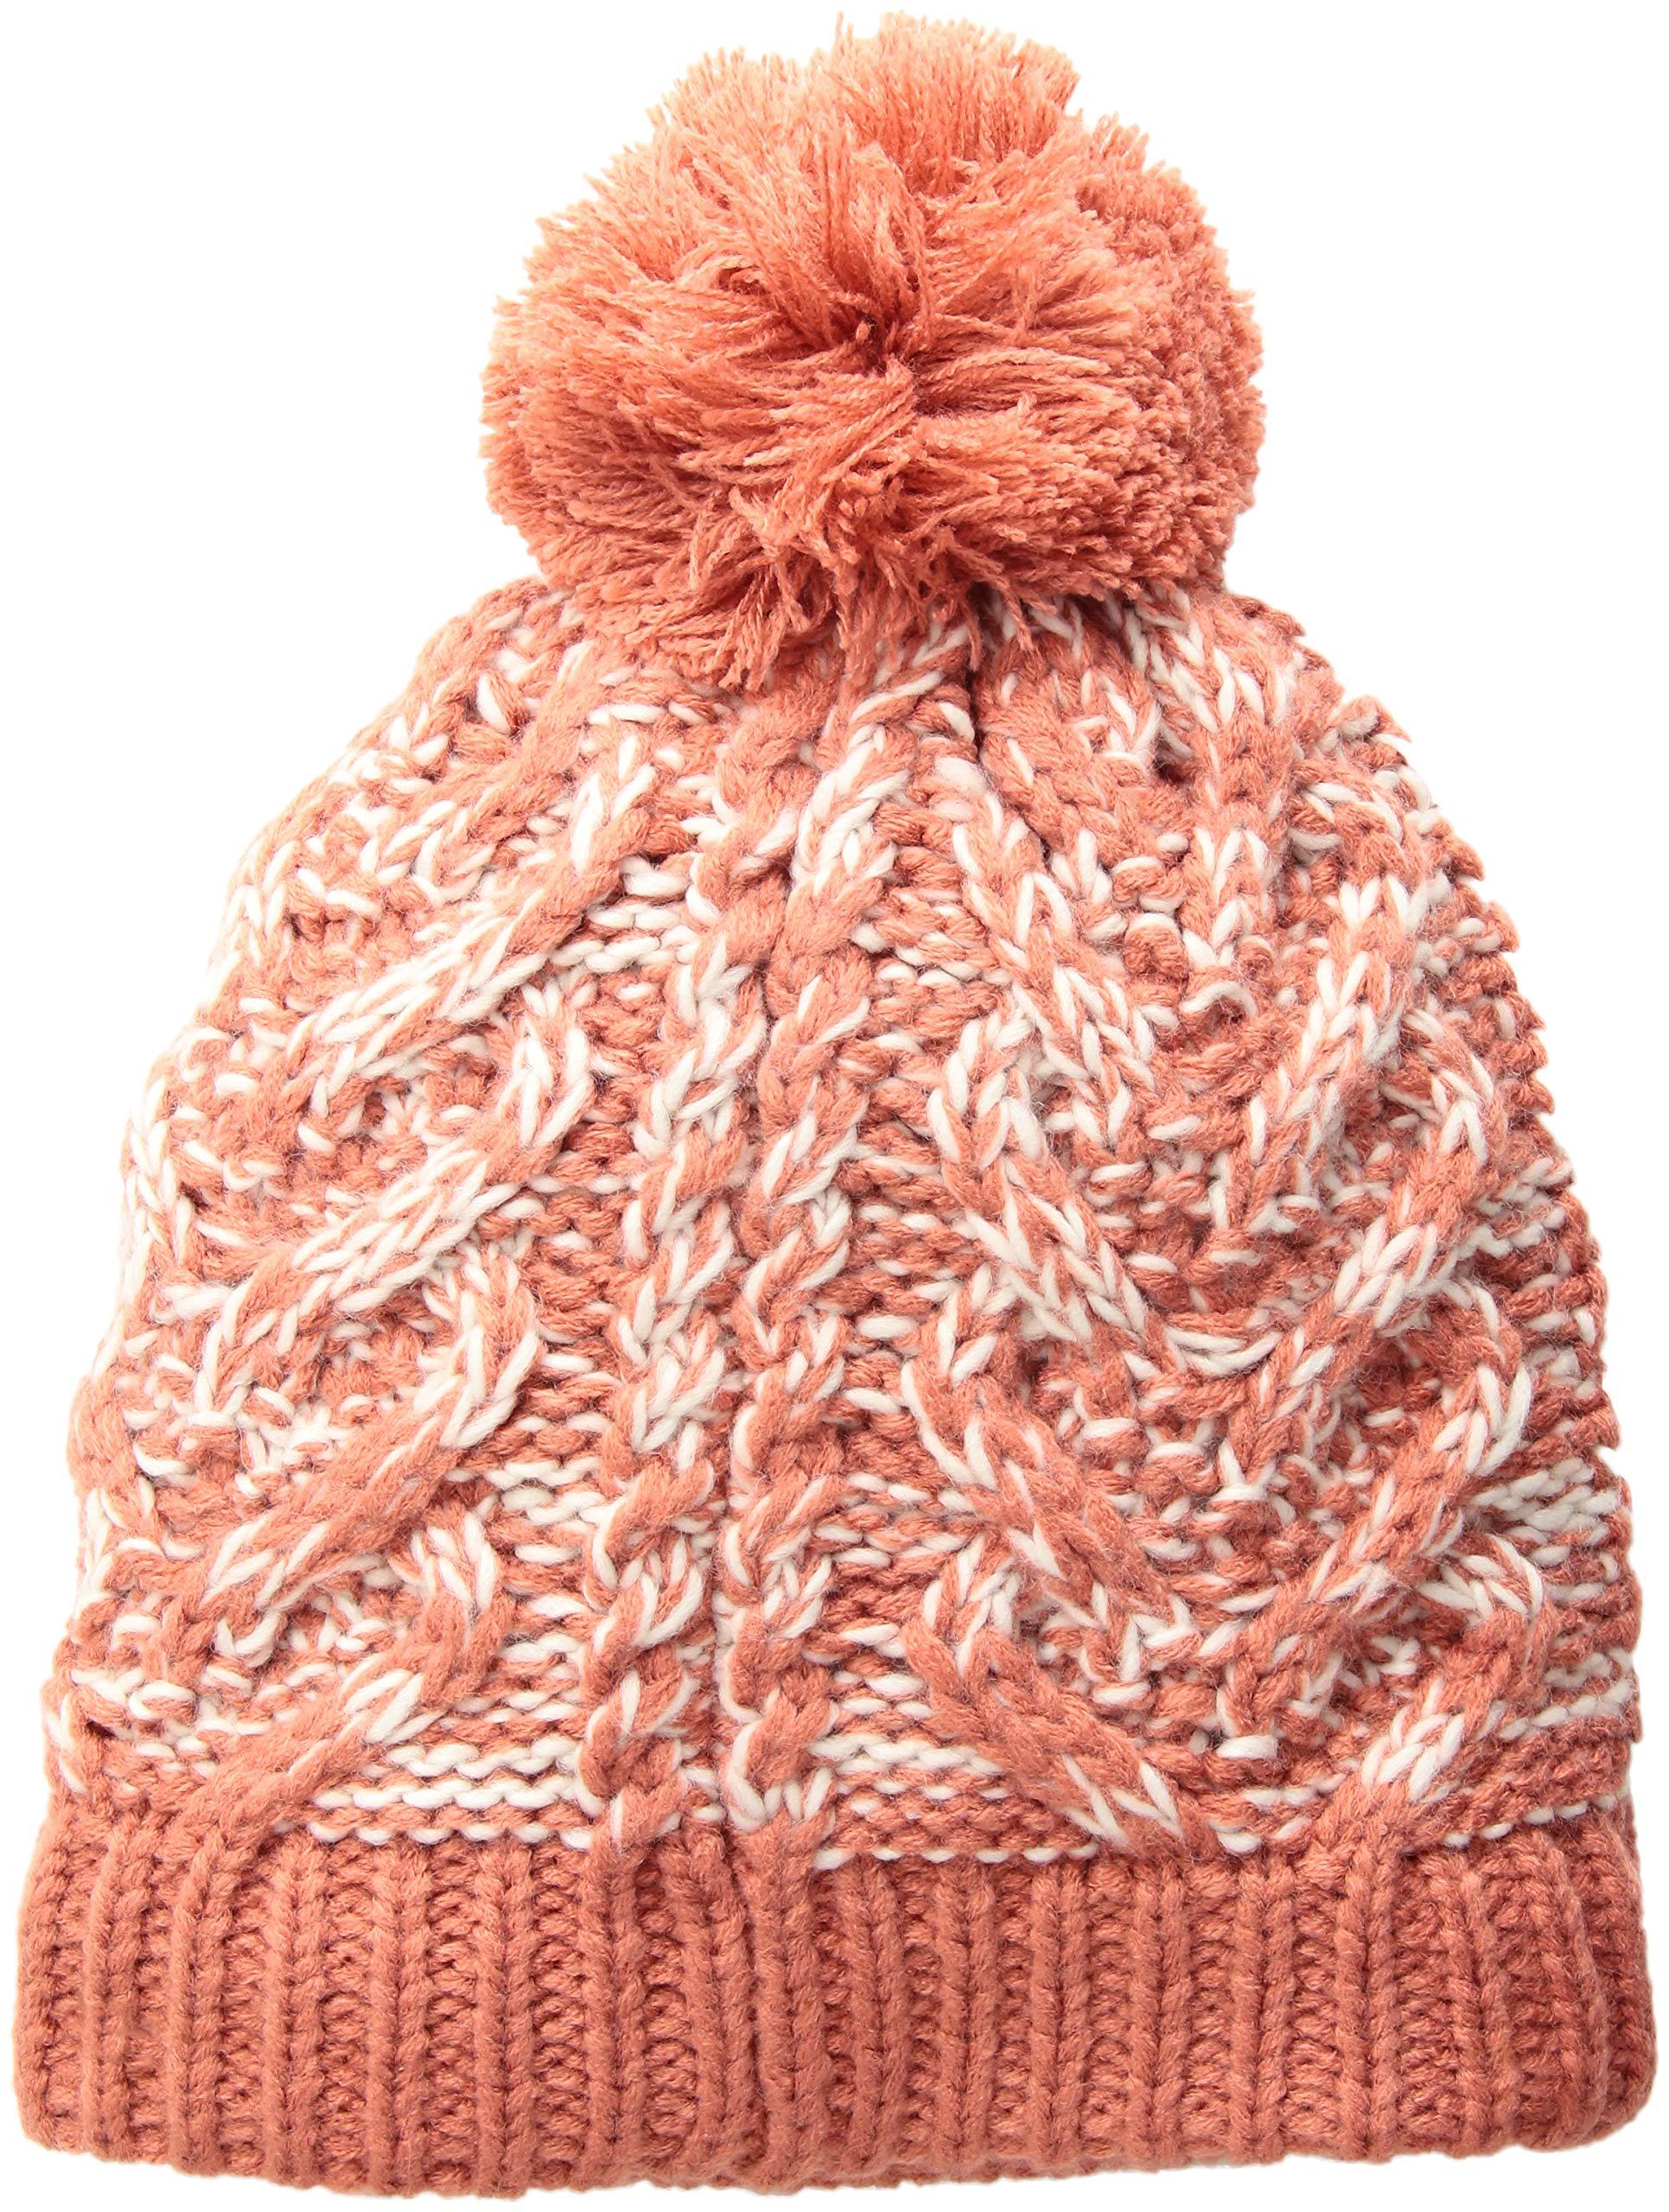 prAna Women's Felicity Beanie Cold Weather Hats, One Size, Rhubarb